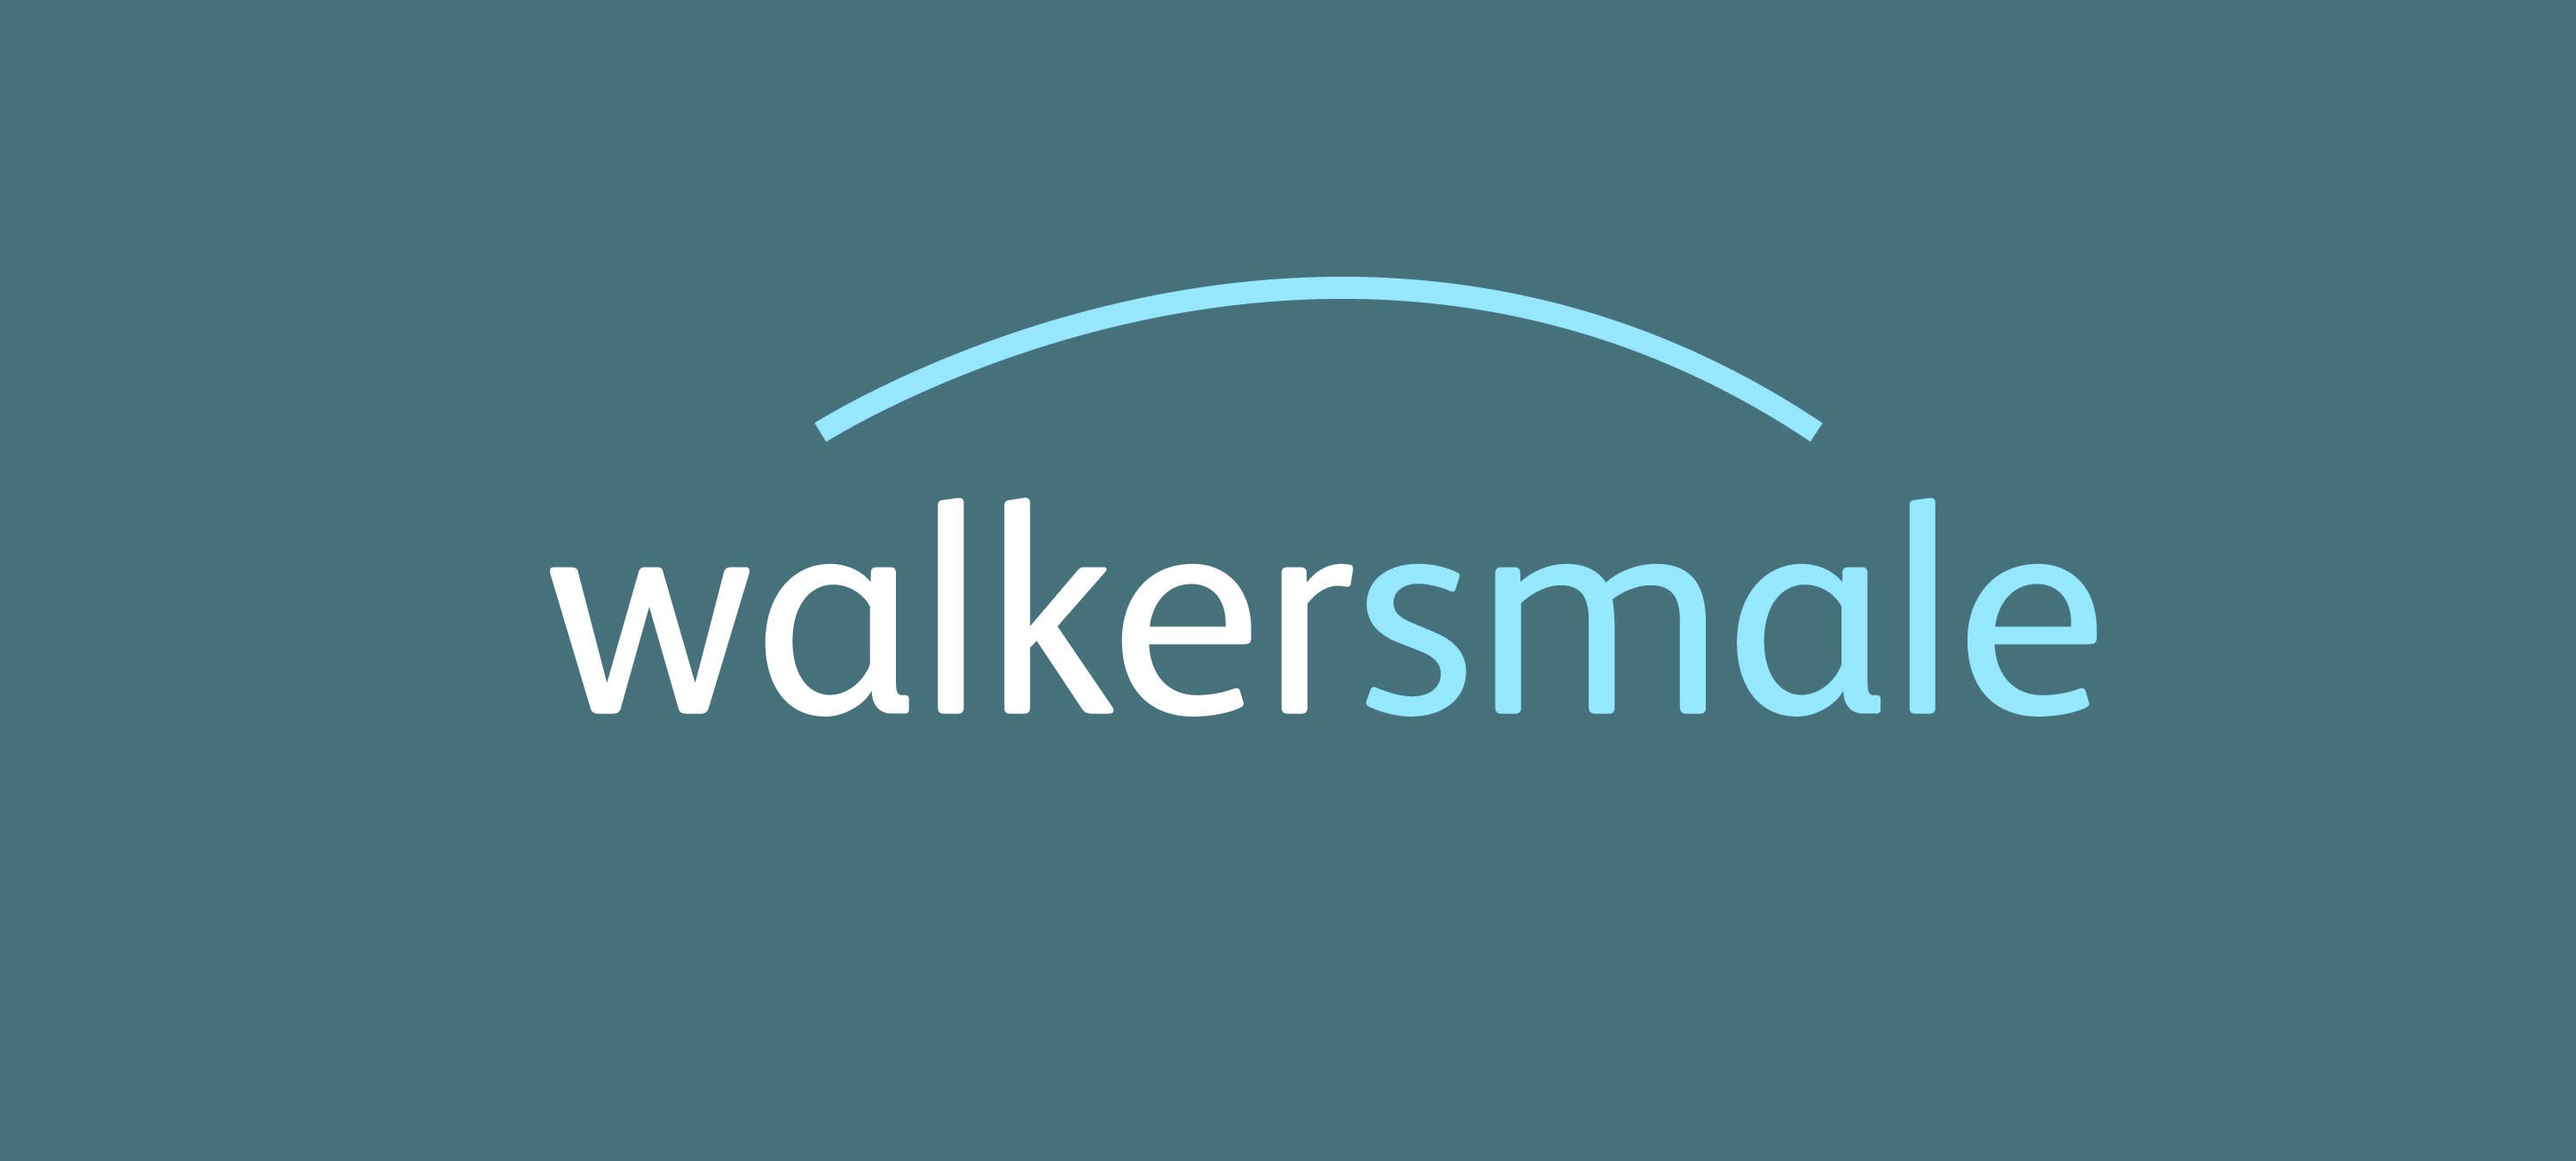 Walker Smale - North Leeds